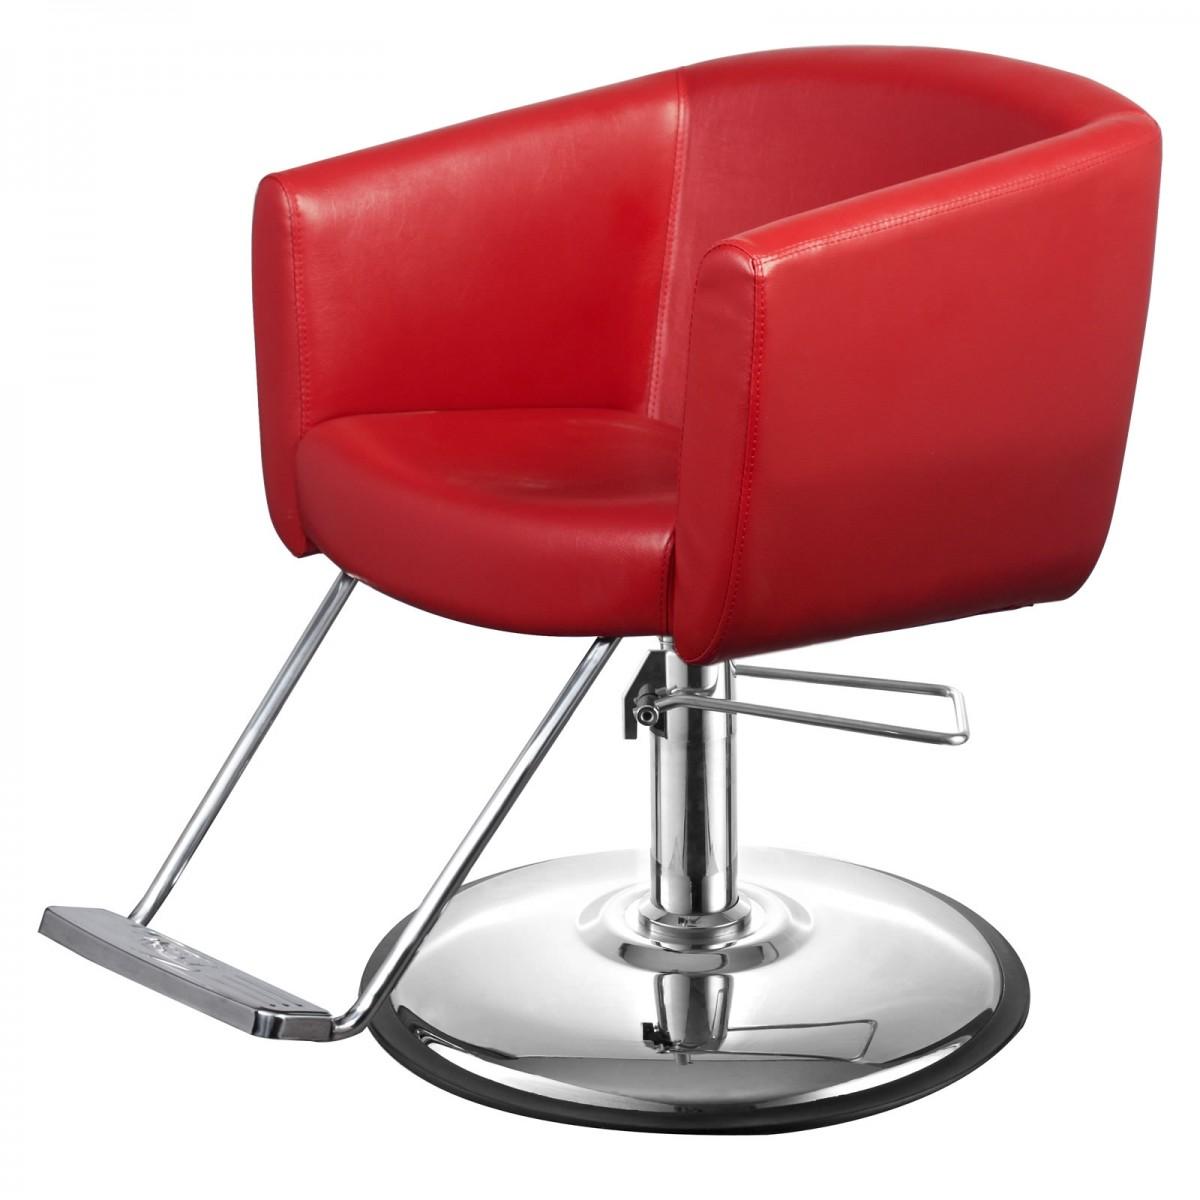 """PORTOFINO"" Salon Styling Chair (Free Shipping)"